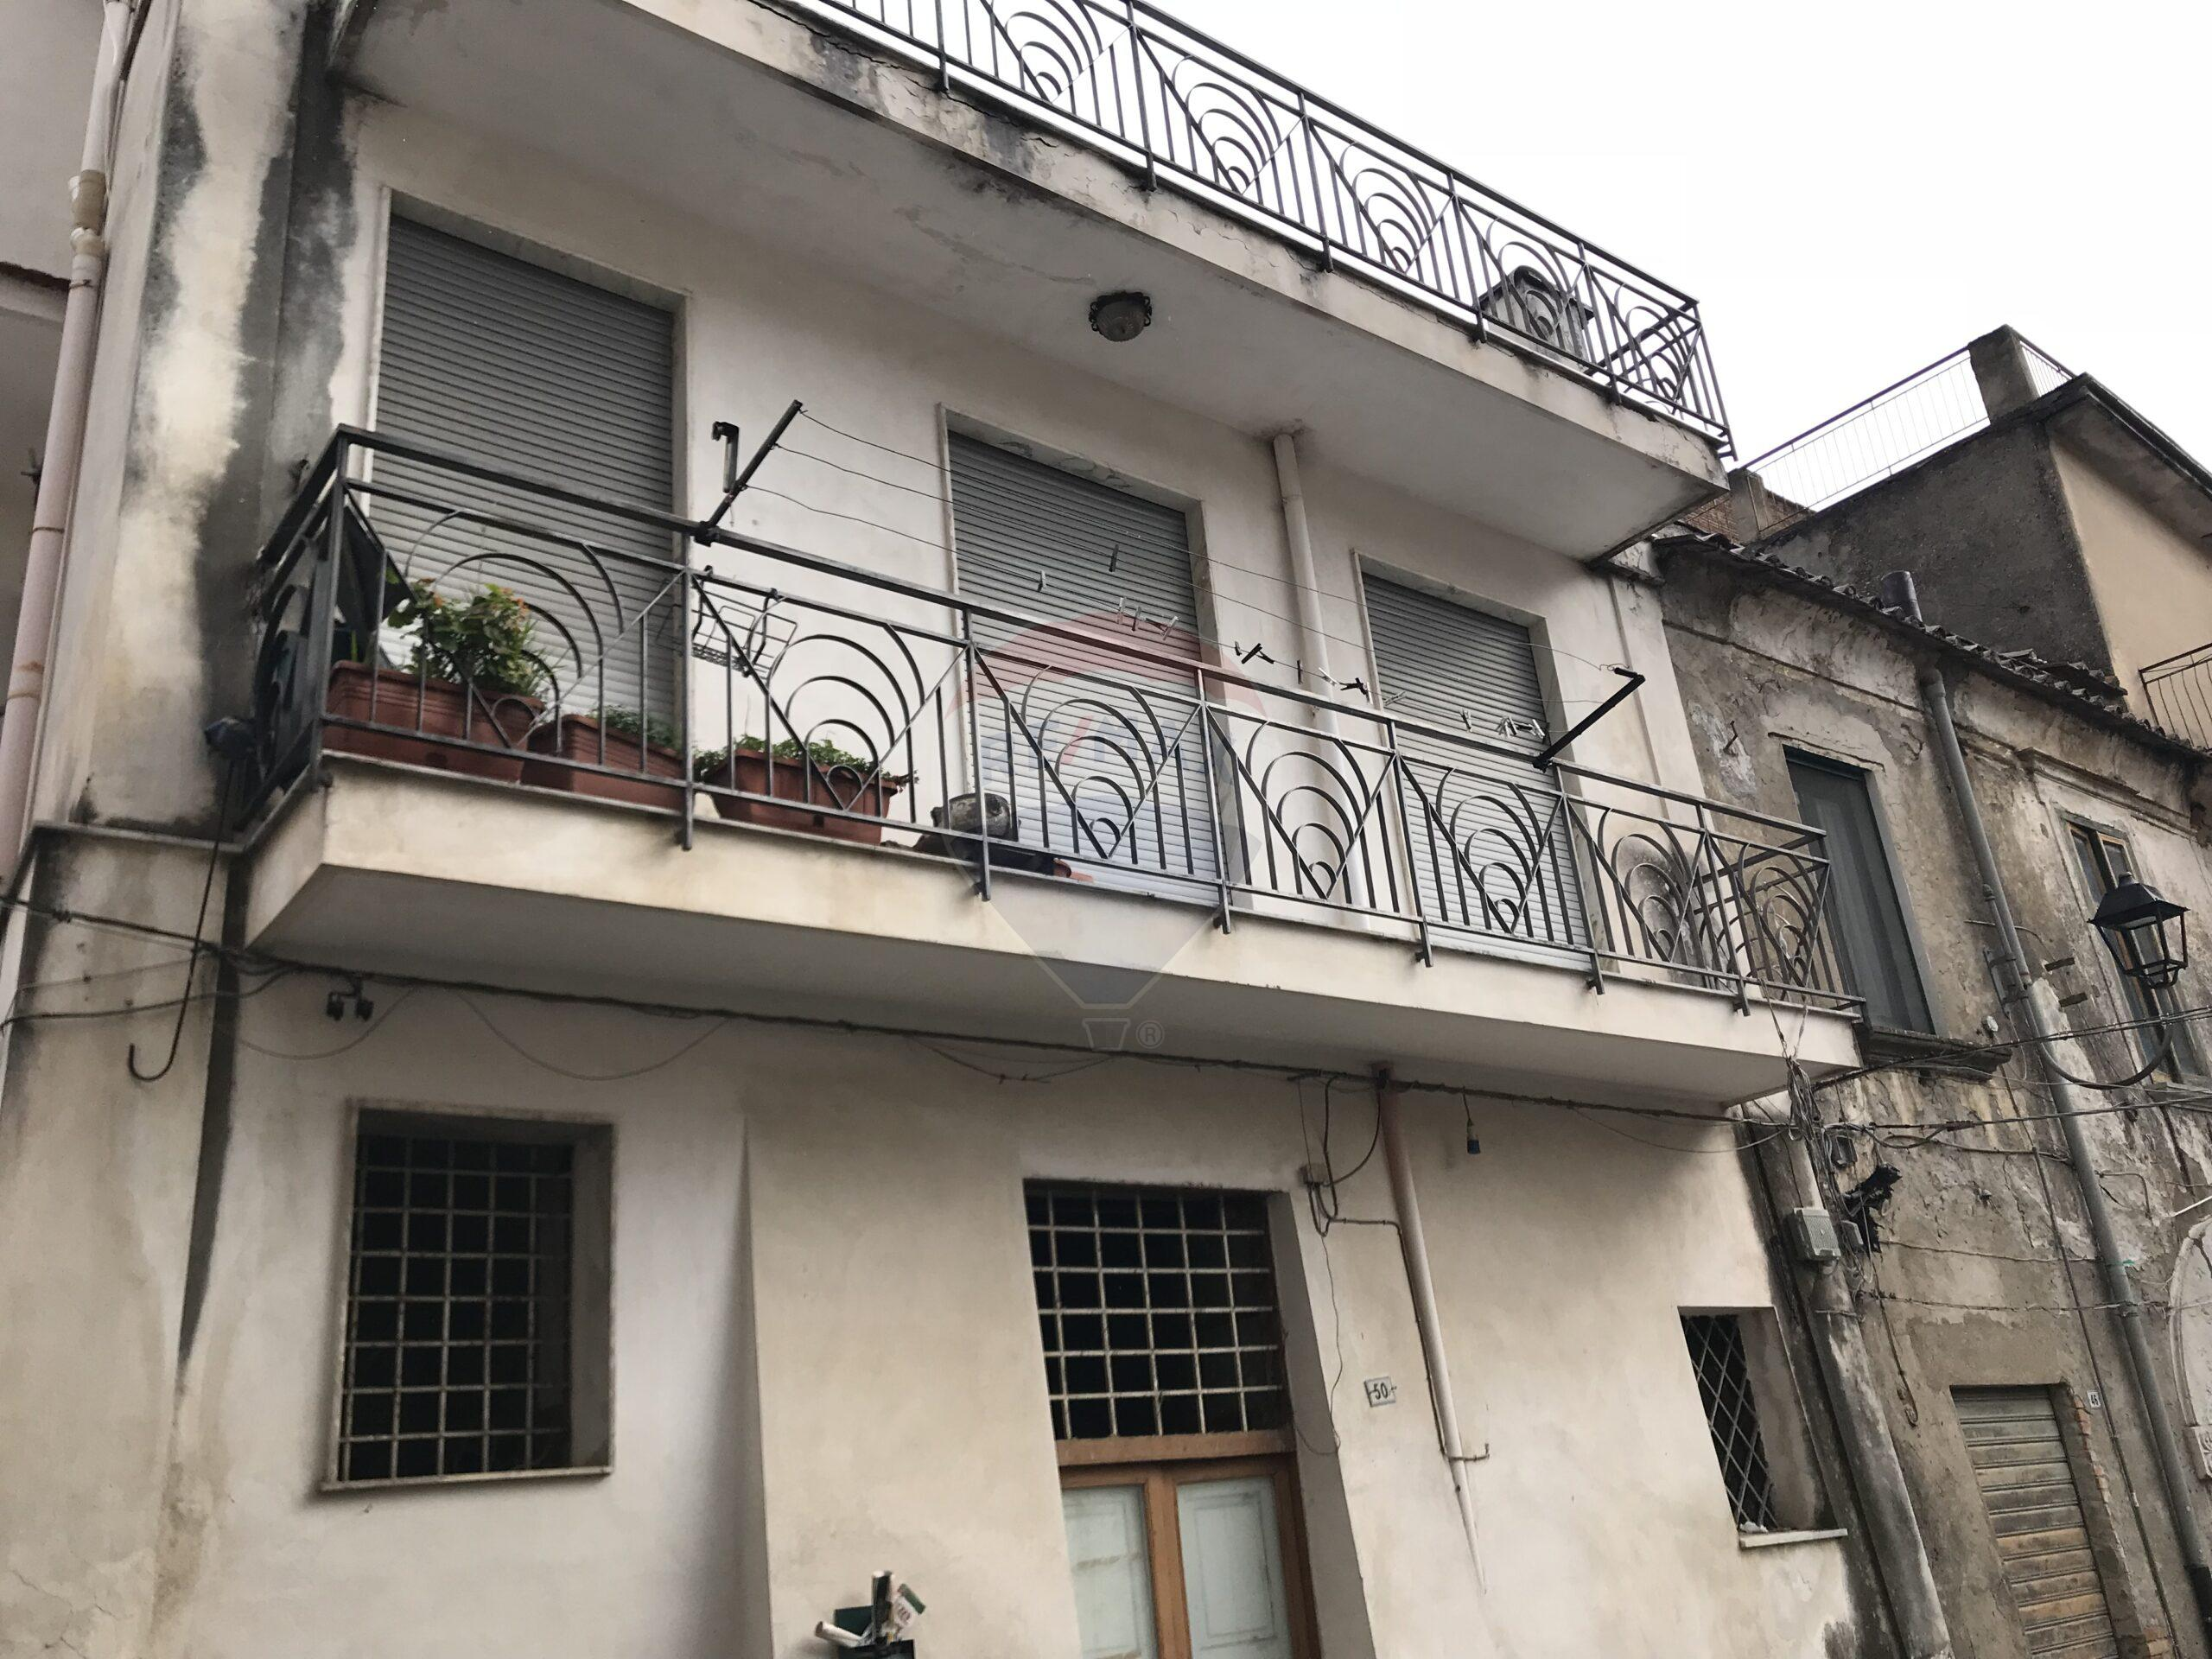 Vendita Appartamento Via Calvanese, 15 Roccapiemonte, SA